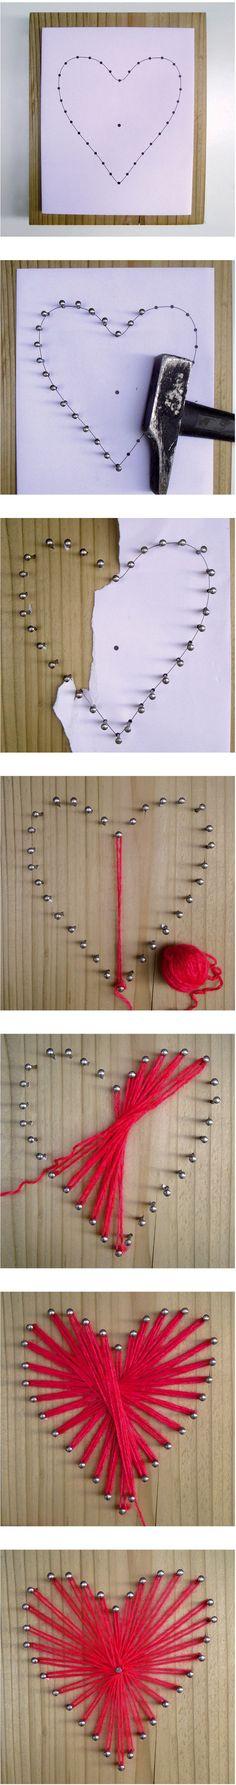 DIY : #saintValentin - valentine's string art - String Art Heart - cœur en fil tendu - tableau de fil - © solange abaziou - http://www.soyou.fr/